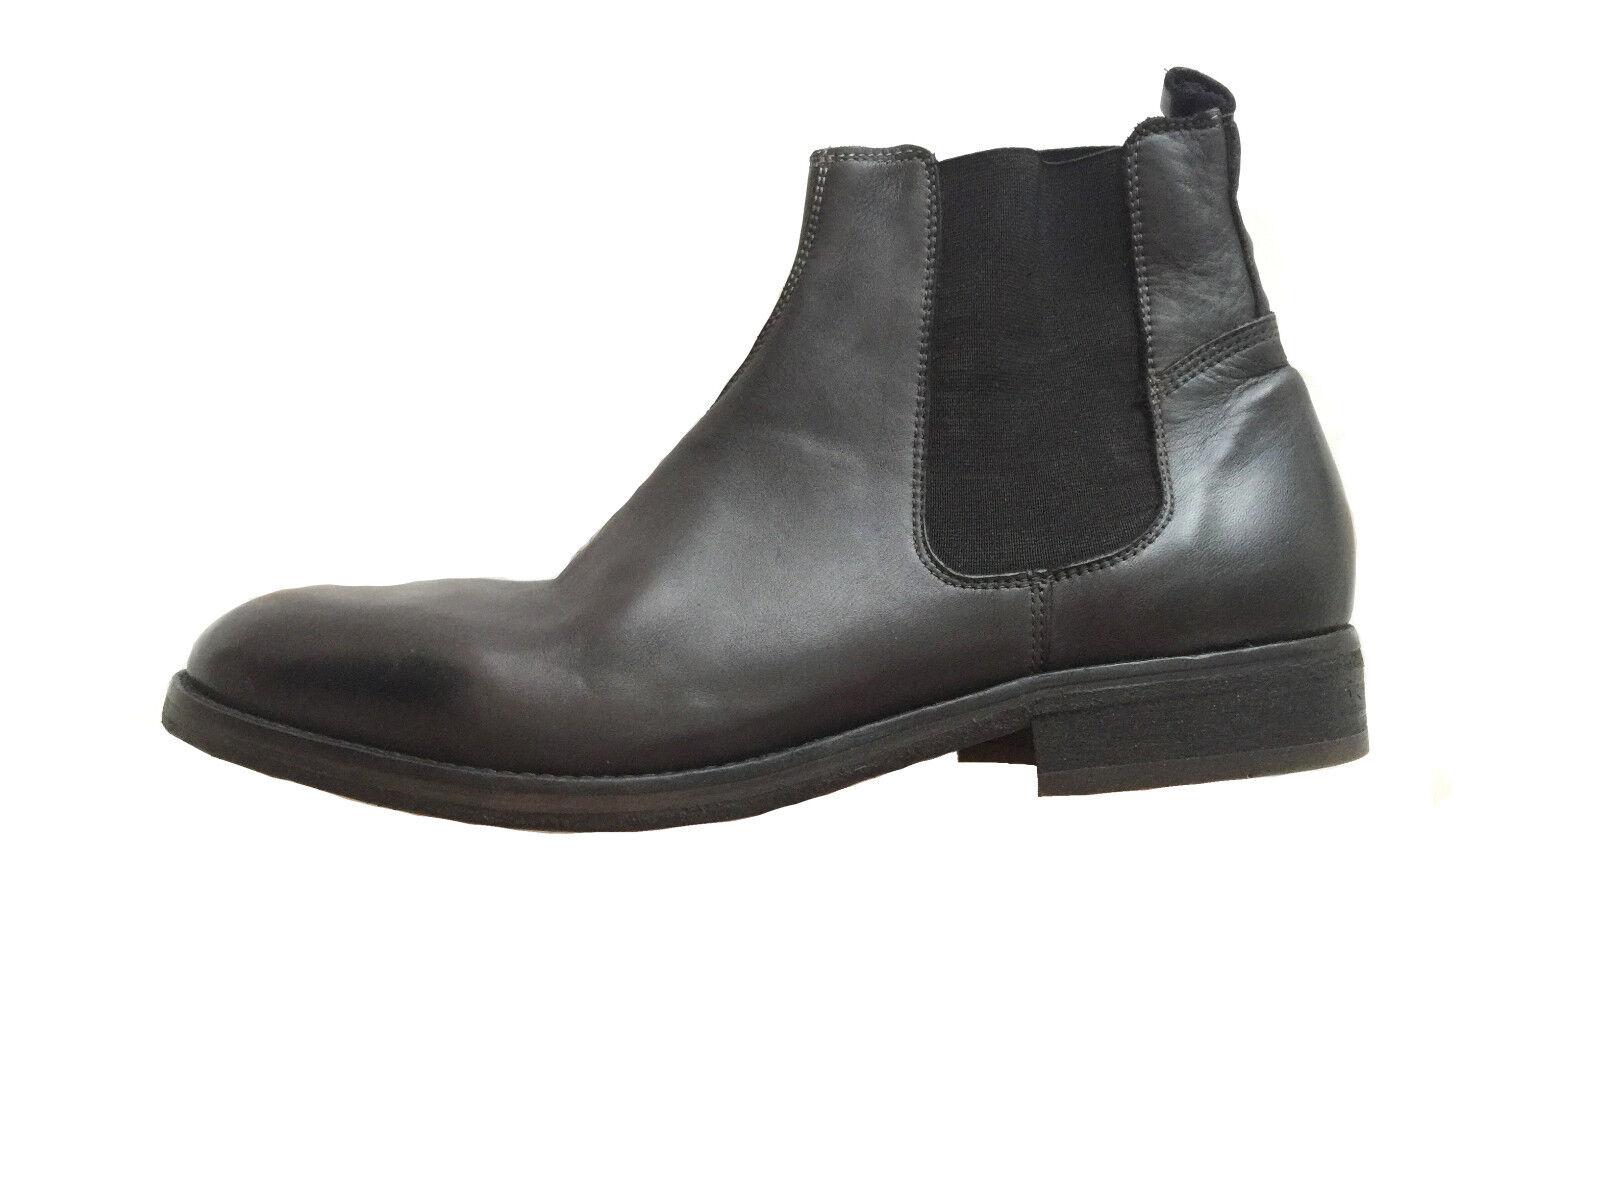 NEU Herren Schuhe Hudson London Chelseaboots Gr.45 schwarz echtes Leder